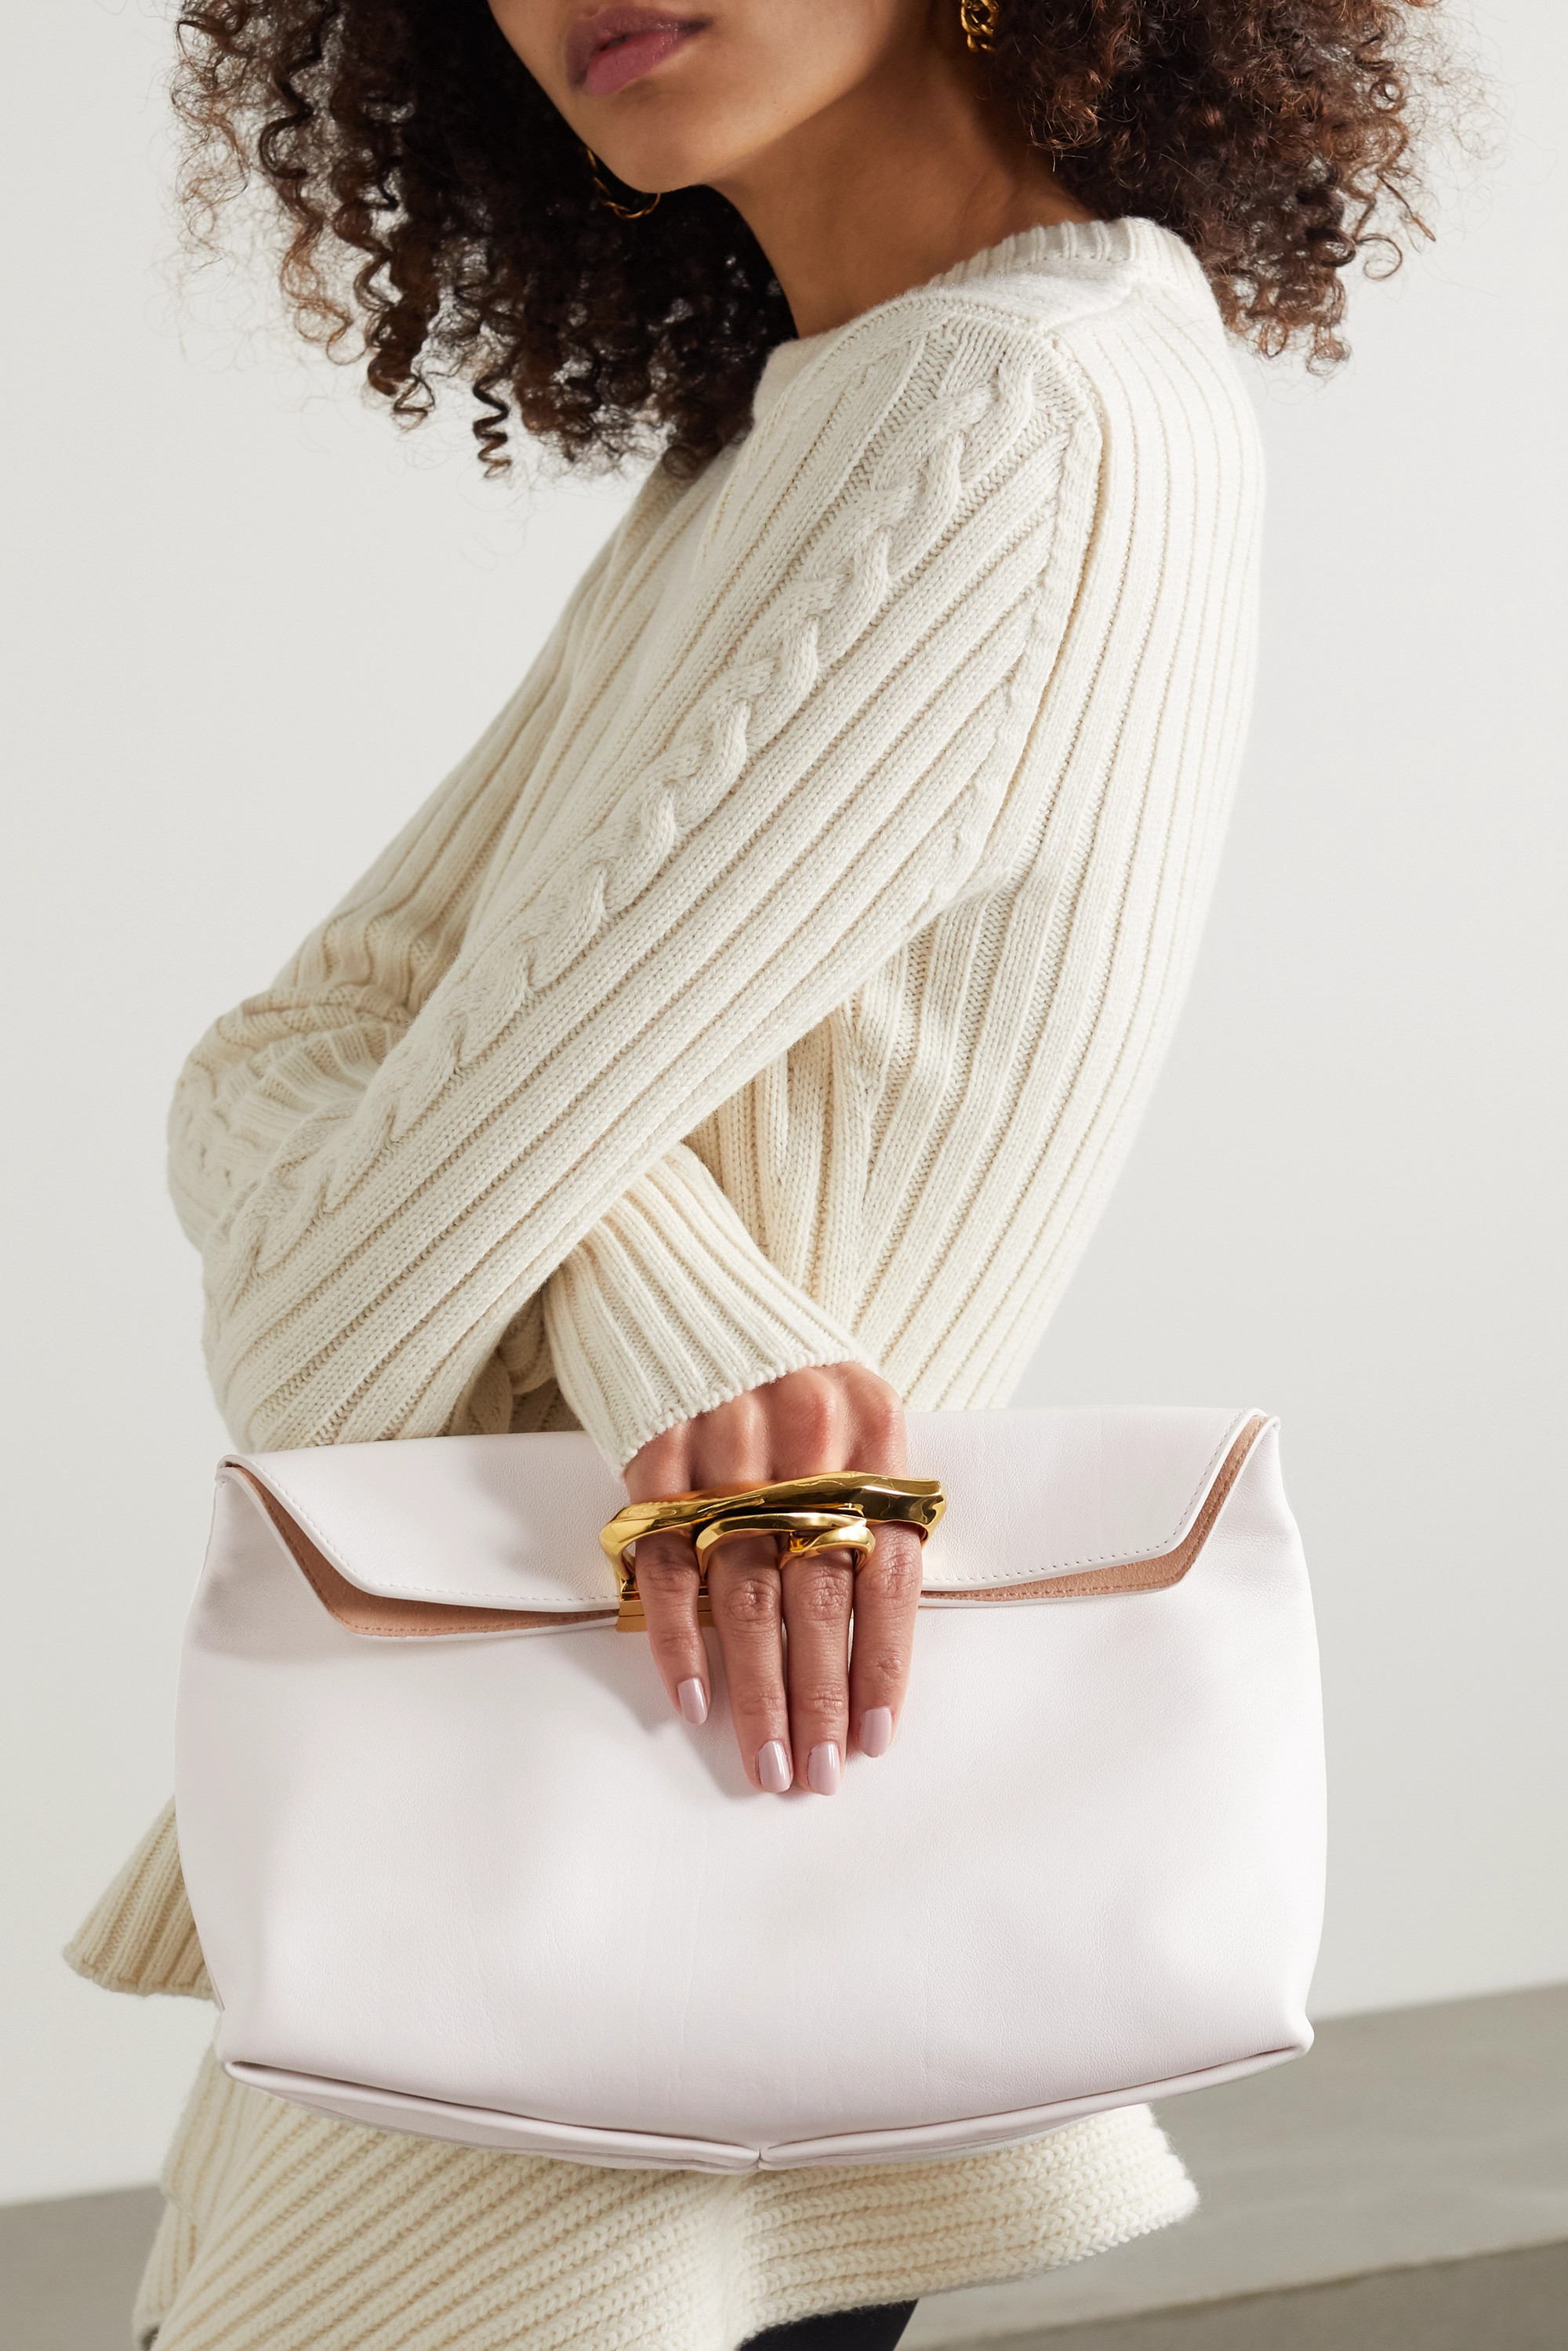 Alexander McQueen Sculptural leather pouch